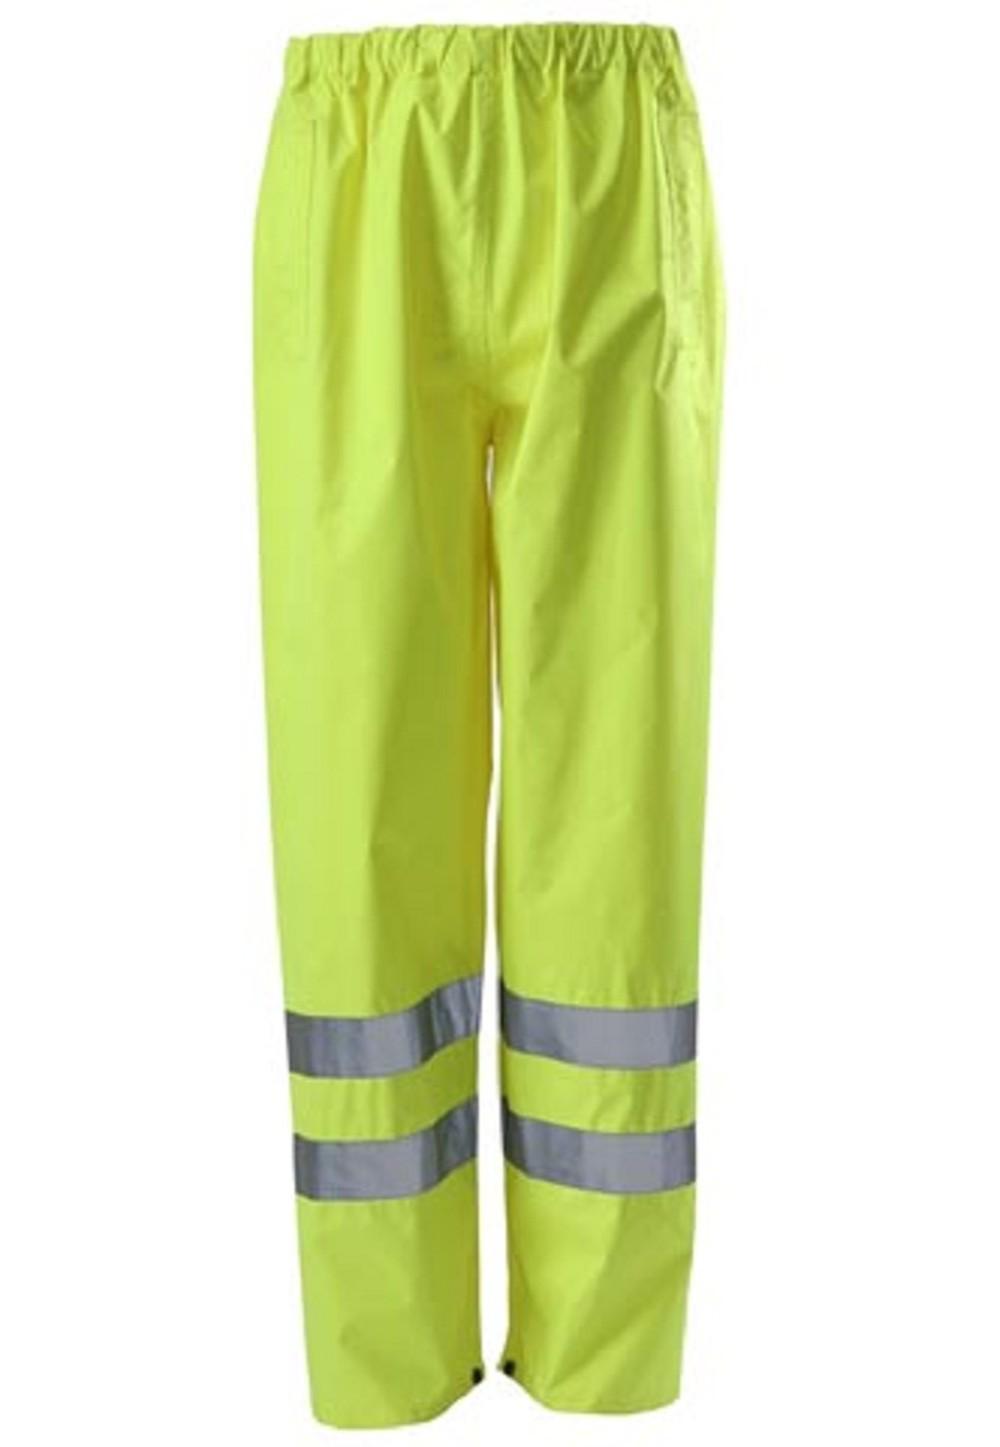 high-visibility-trousers-medium-ref-80202.jpg